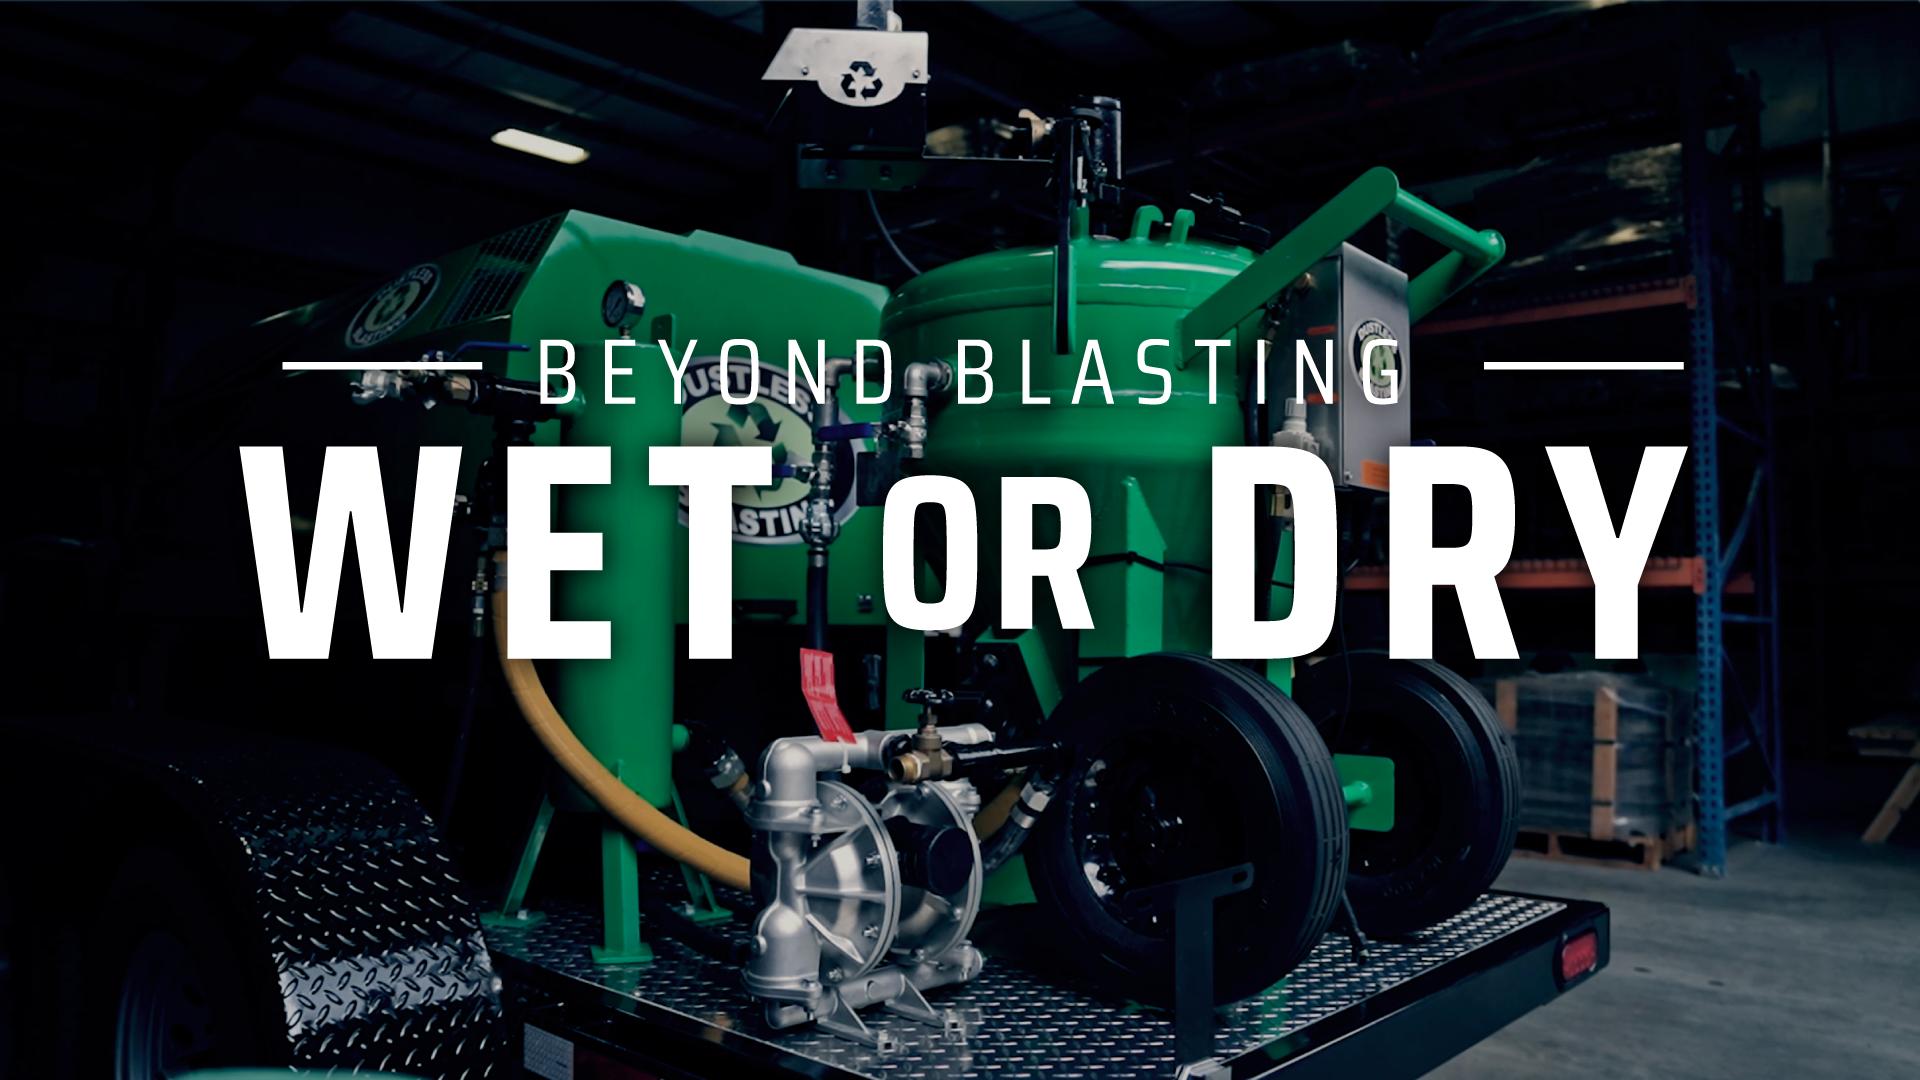 wet or dry blasting